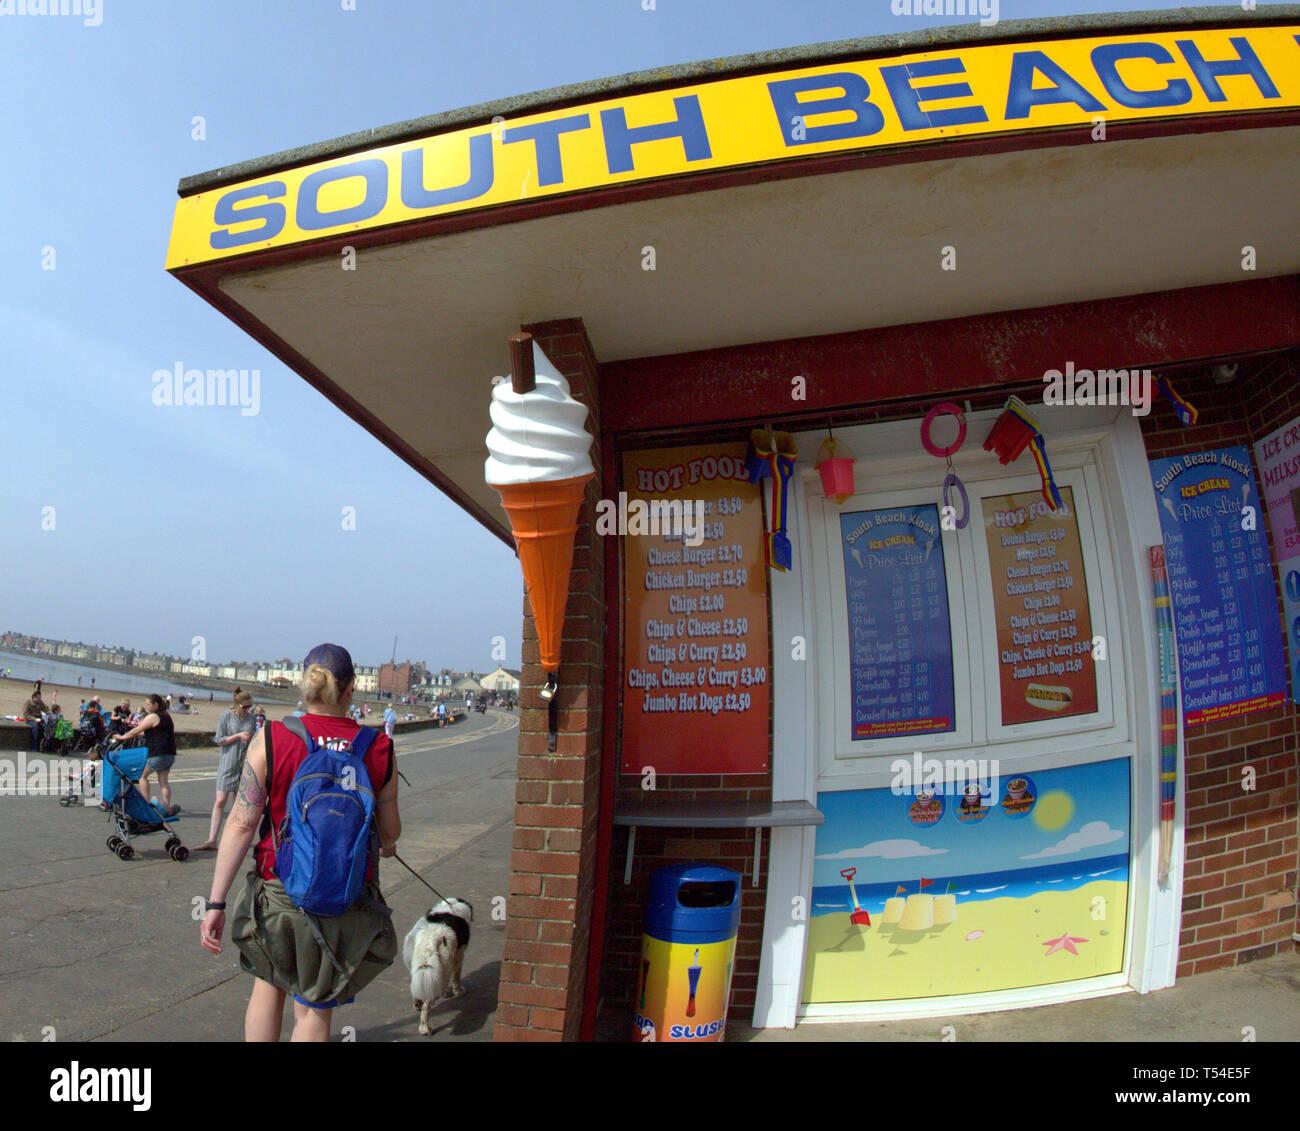 Troon South Beach Stock Photos & Troon South Beach Stock